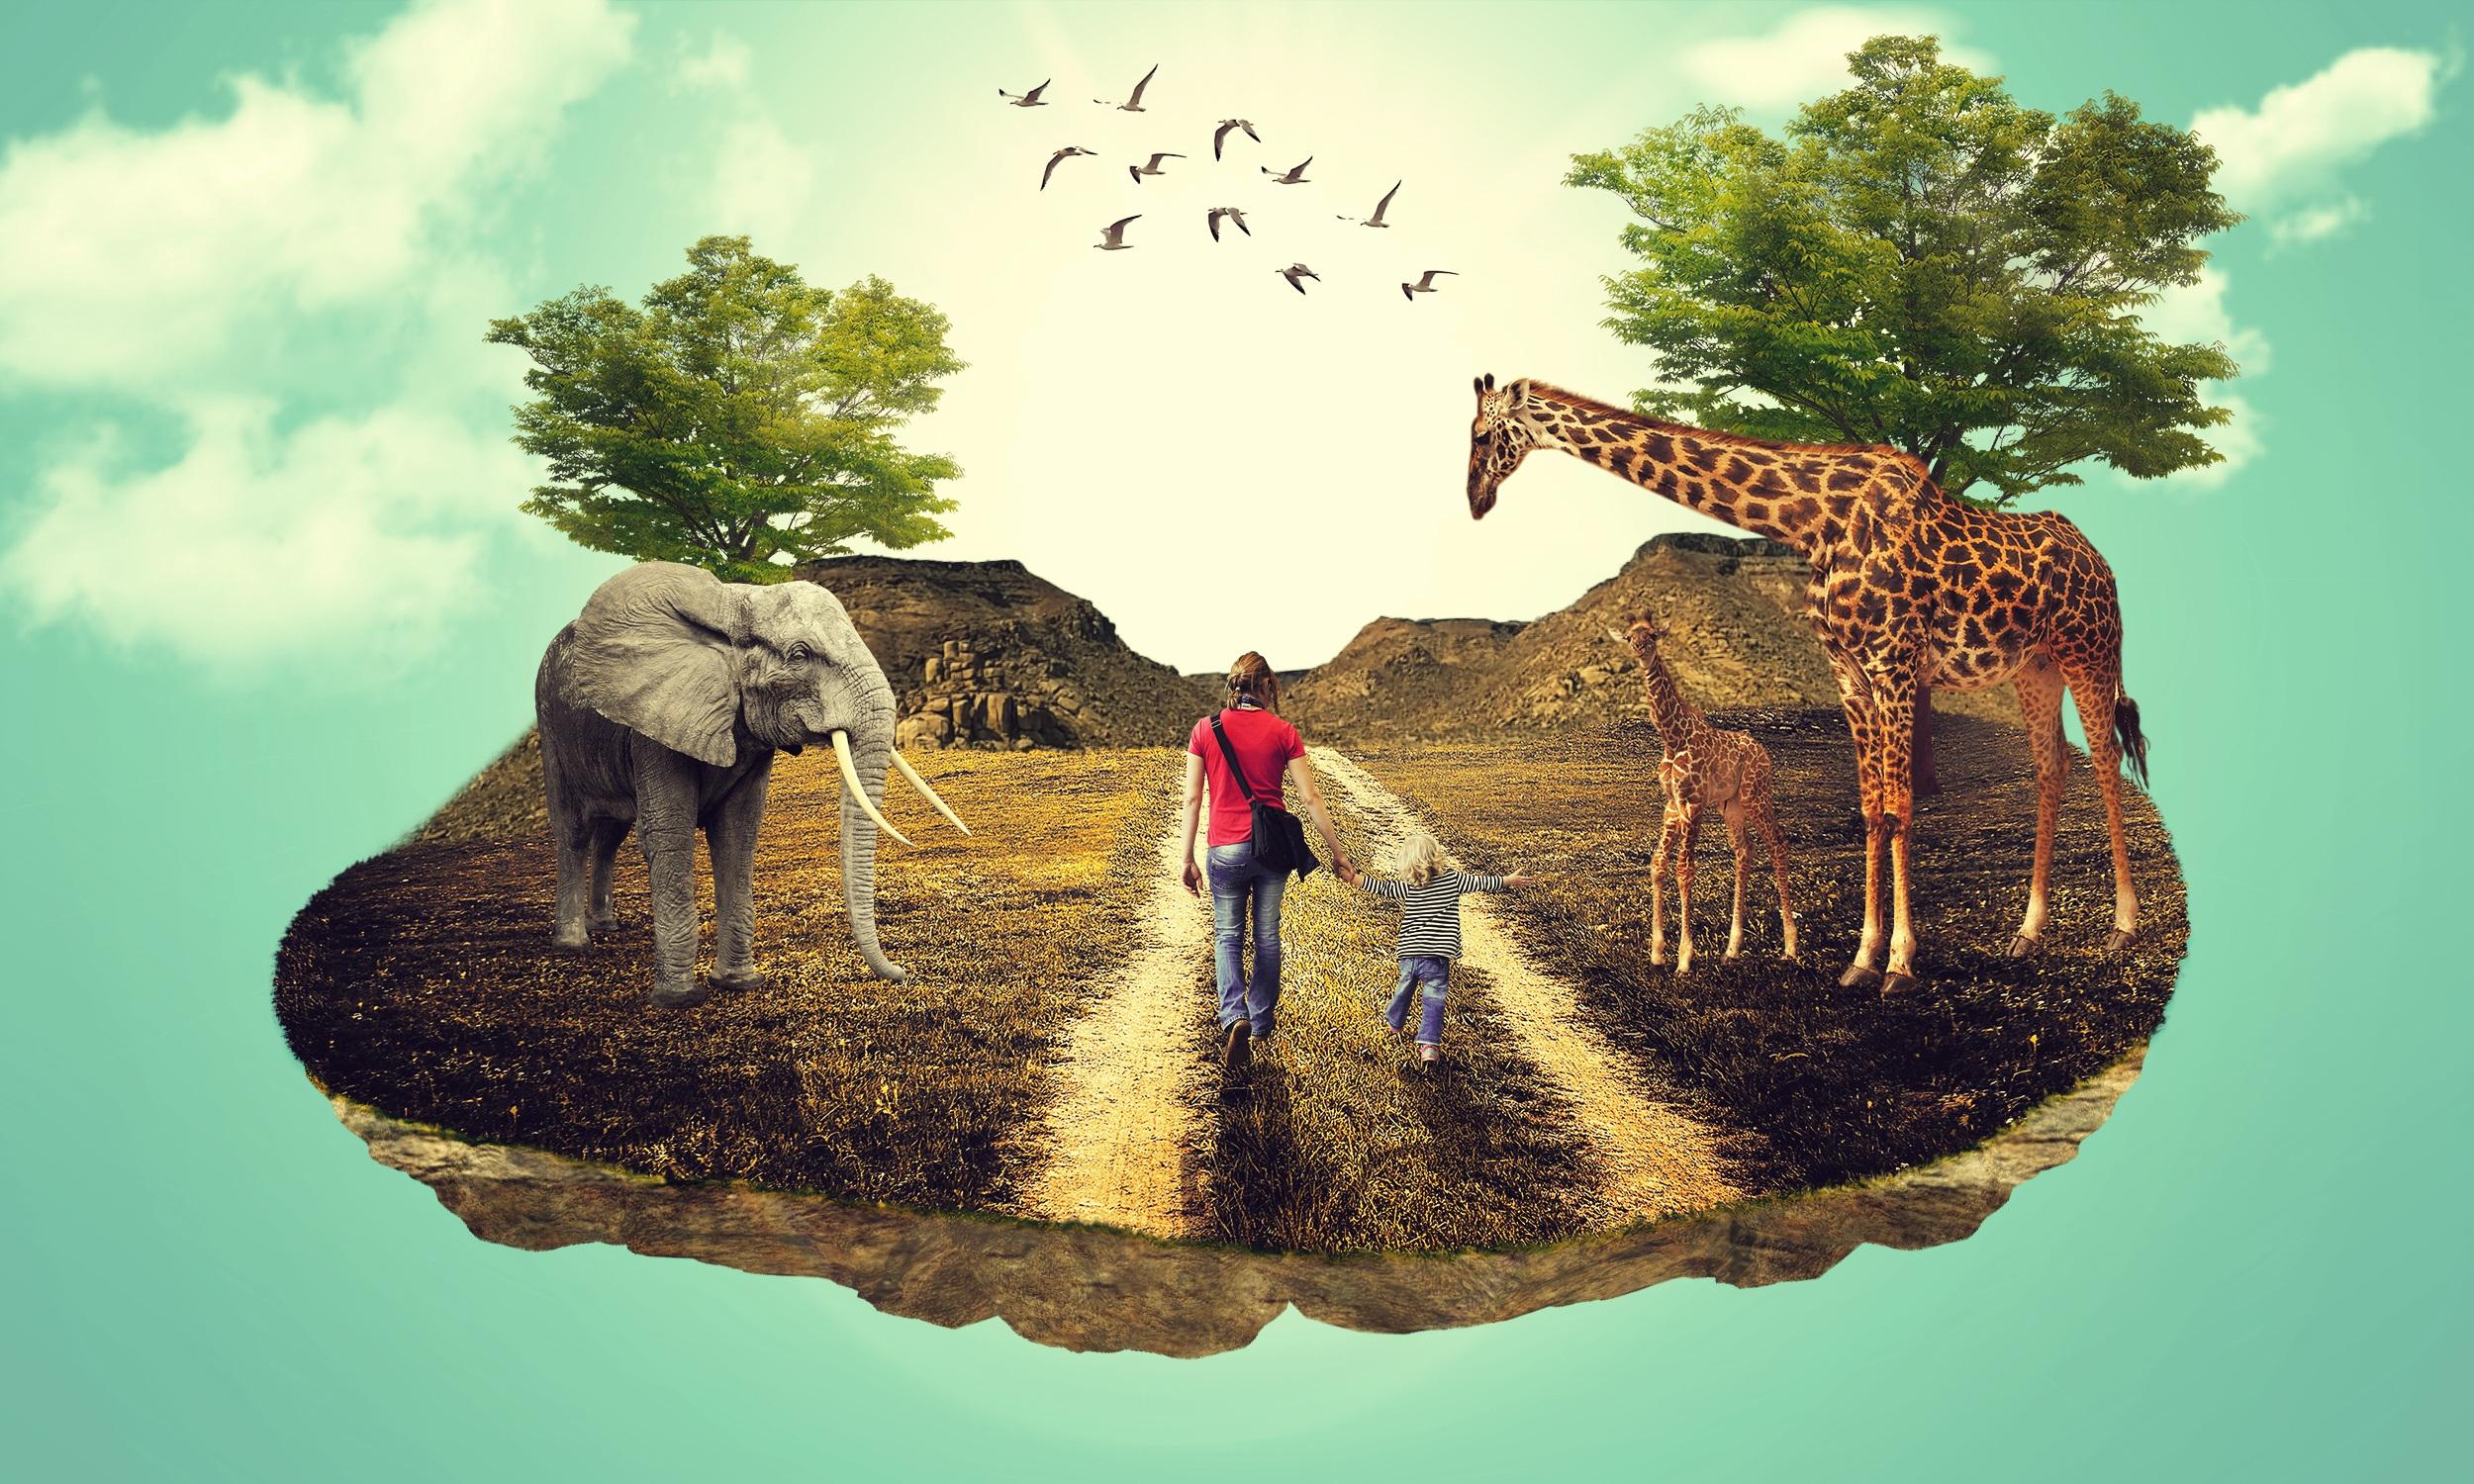 120 Gambar Ilustrasi Ekosistem Taman